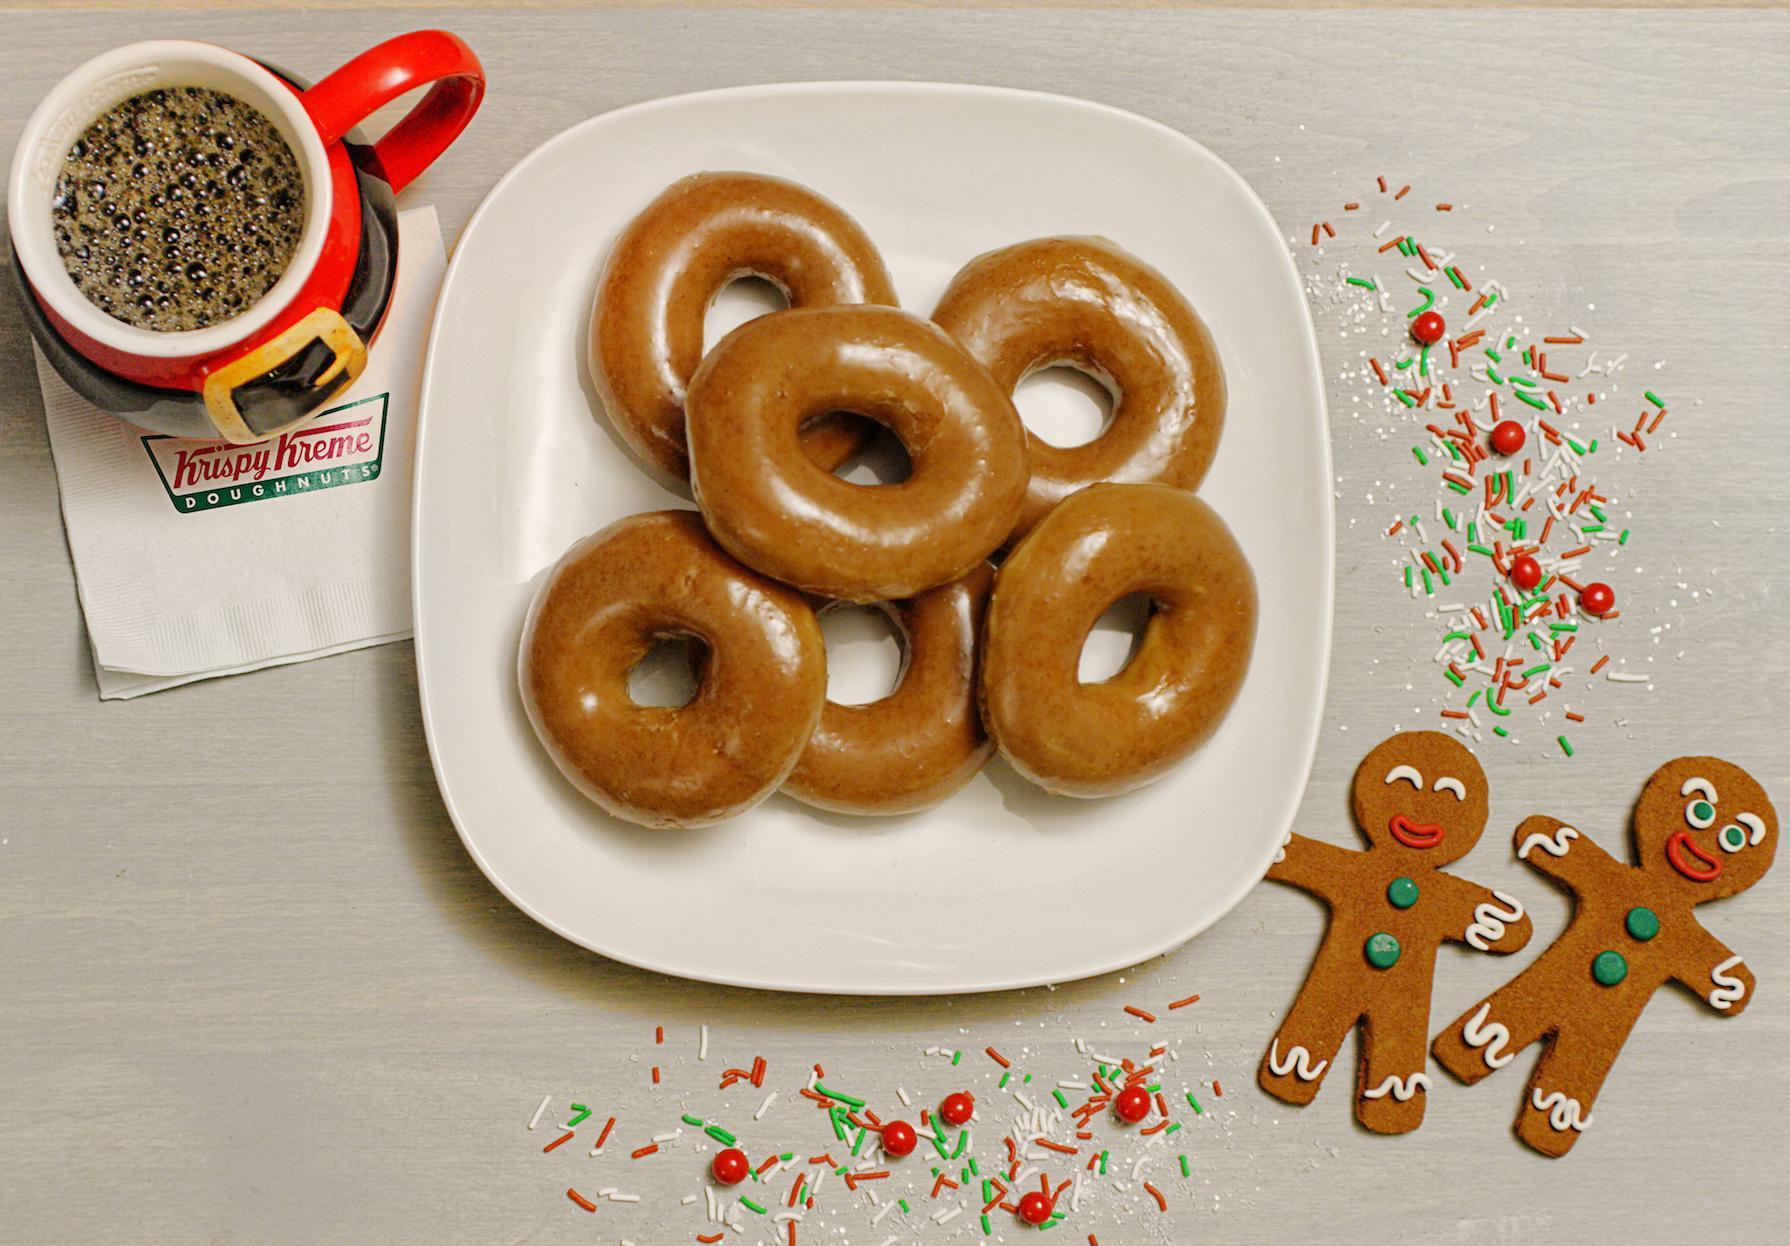 Krispy Kreme's Gingerbread Doughnuts Are Coming Back